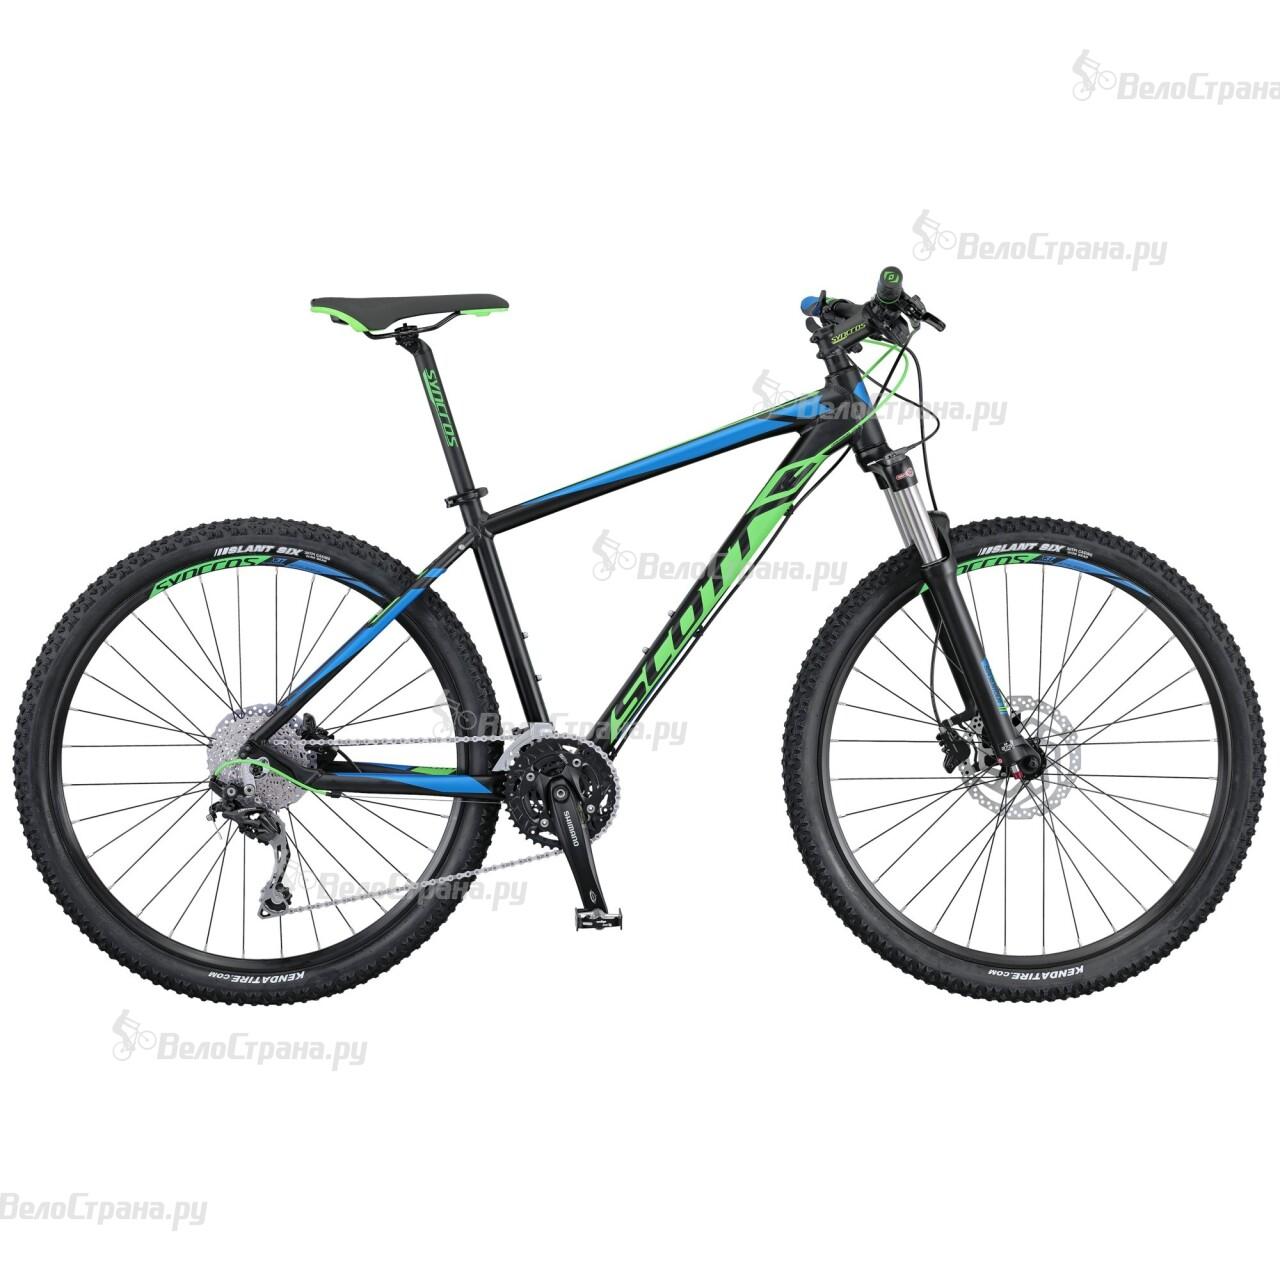 Велосипед Scott Aspect 720 (2016) велосипед scott aspect 720 27 5 2016